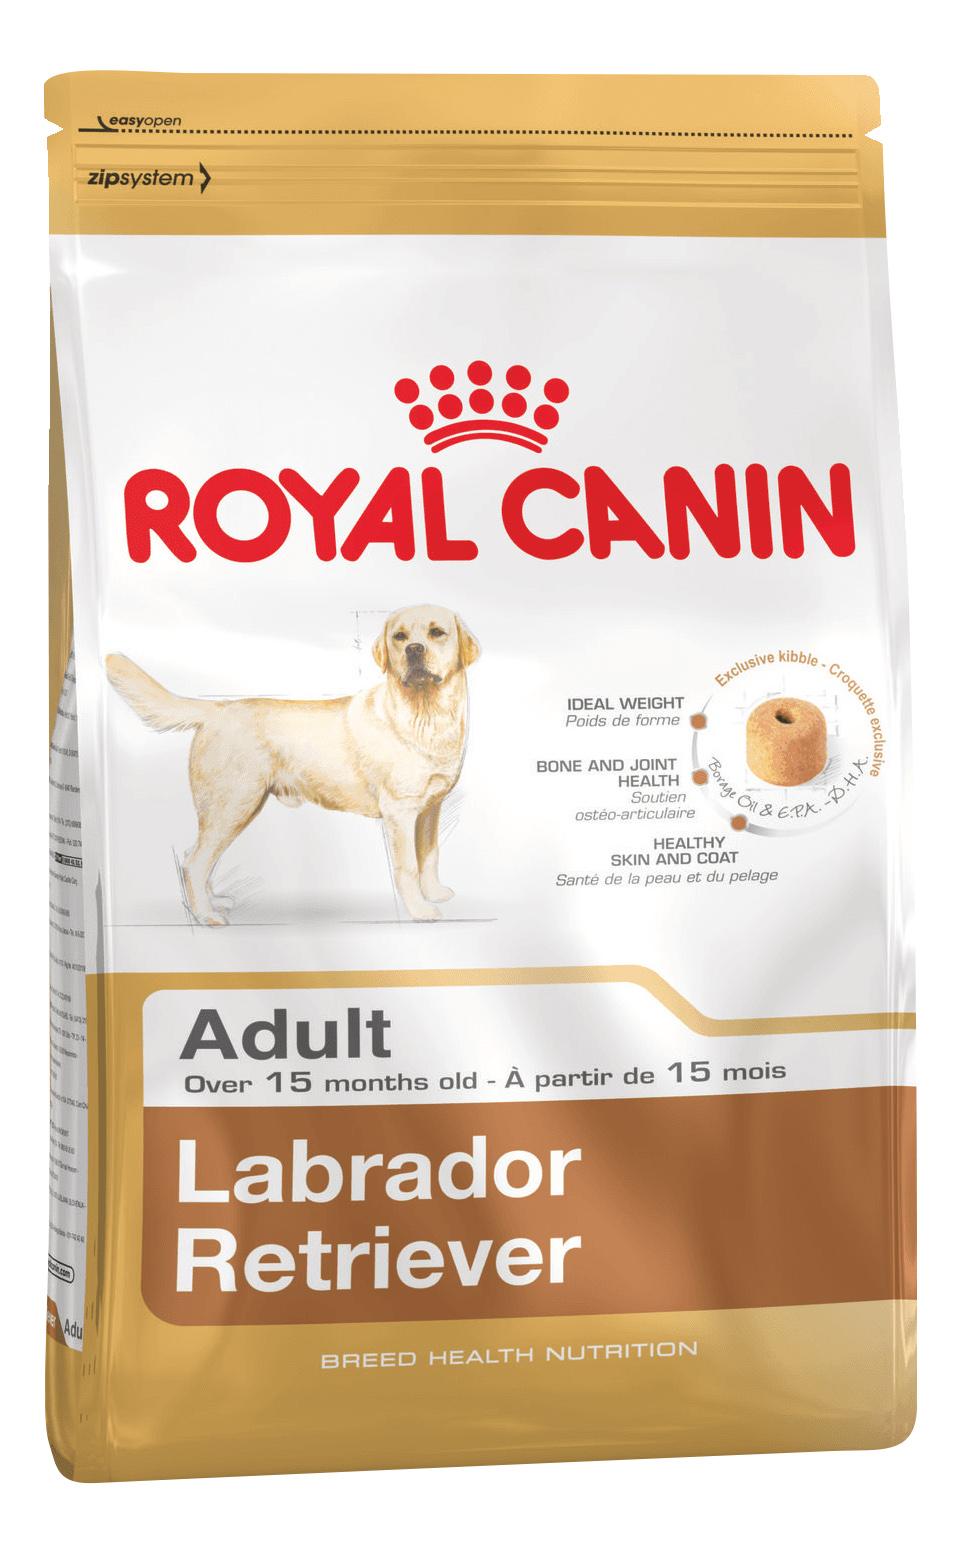 ROYAL CANIN ADULT LABRADOR RETRIEVER